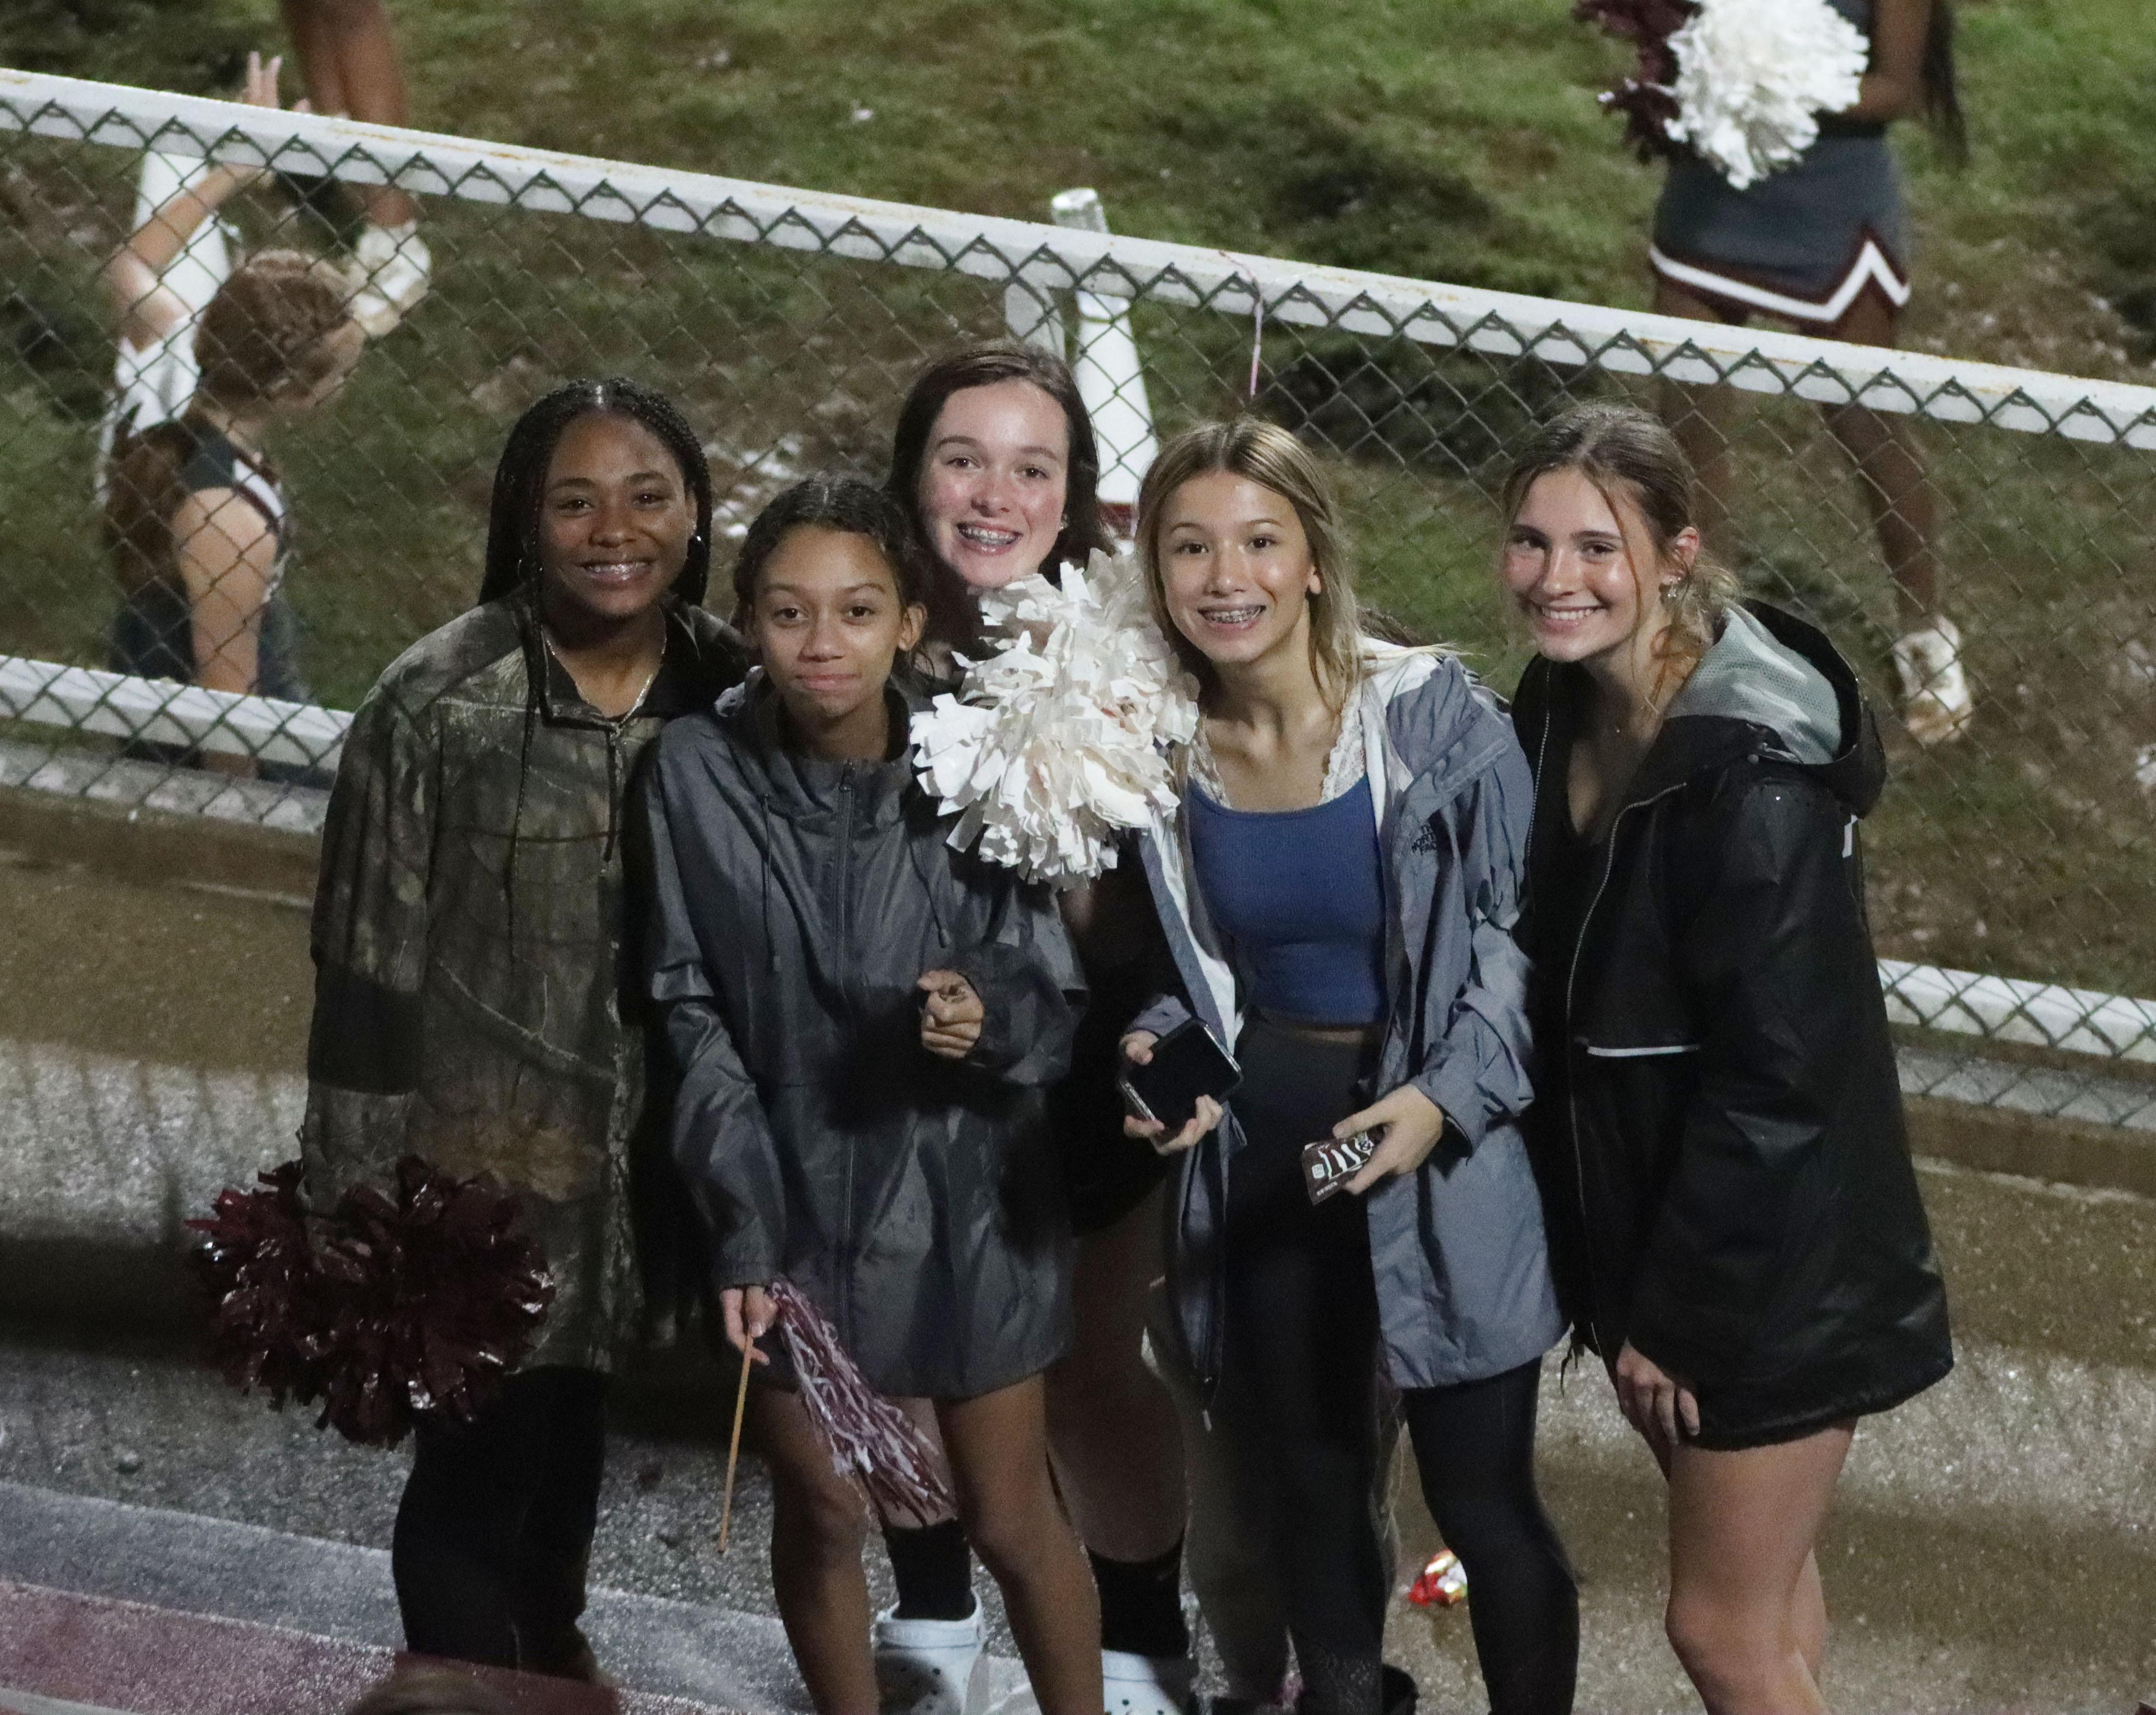 Students at jamboree game 2021